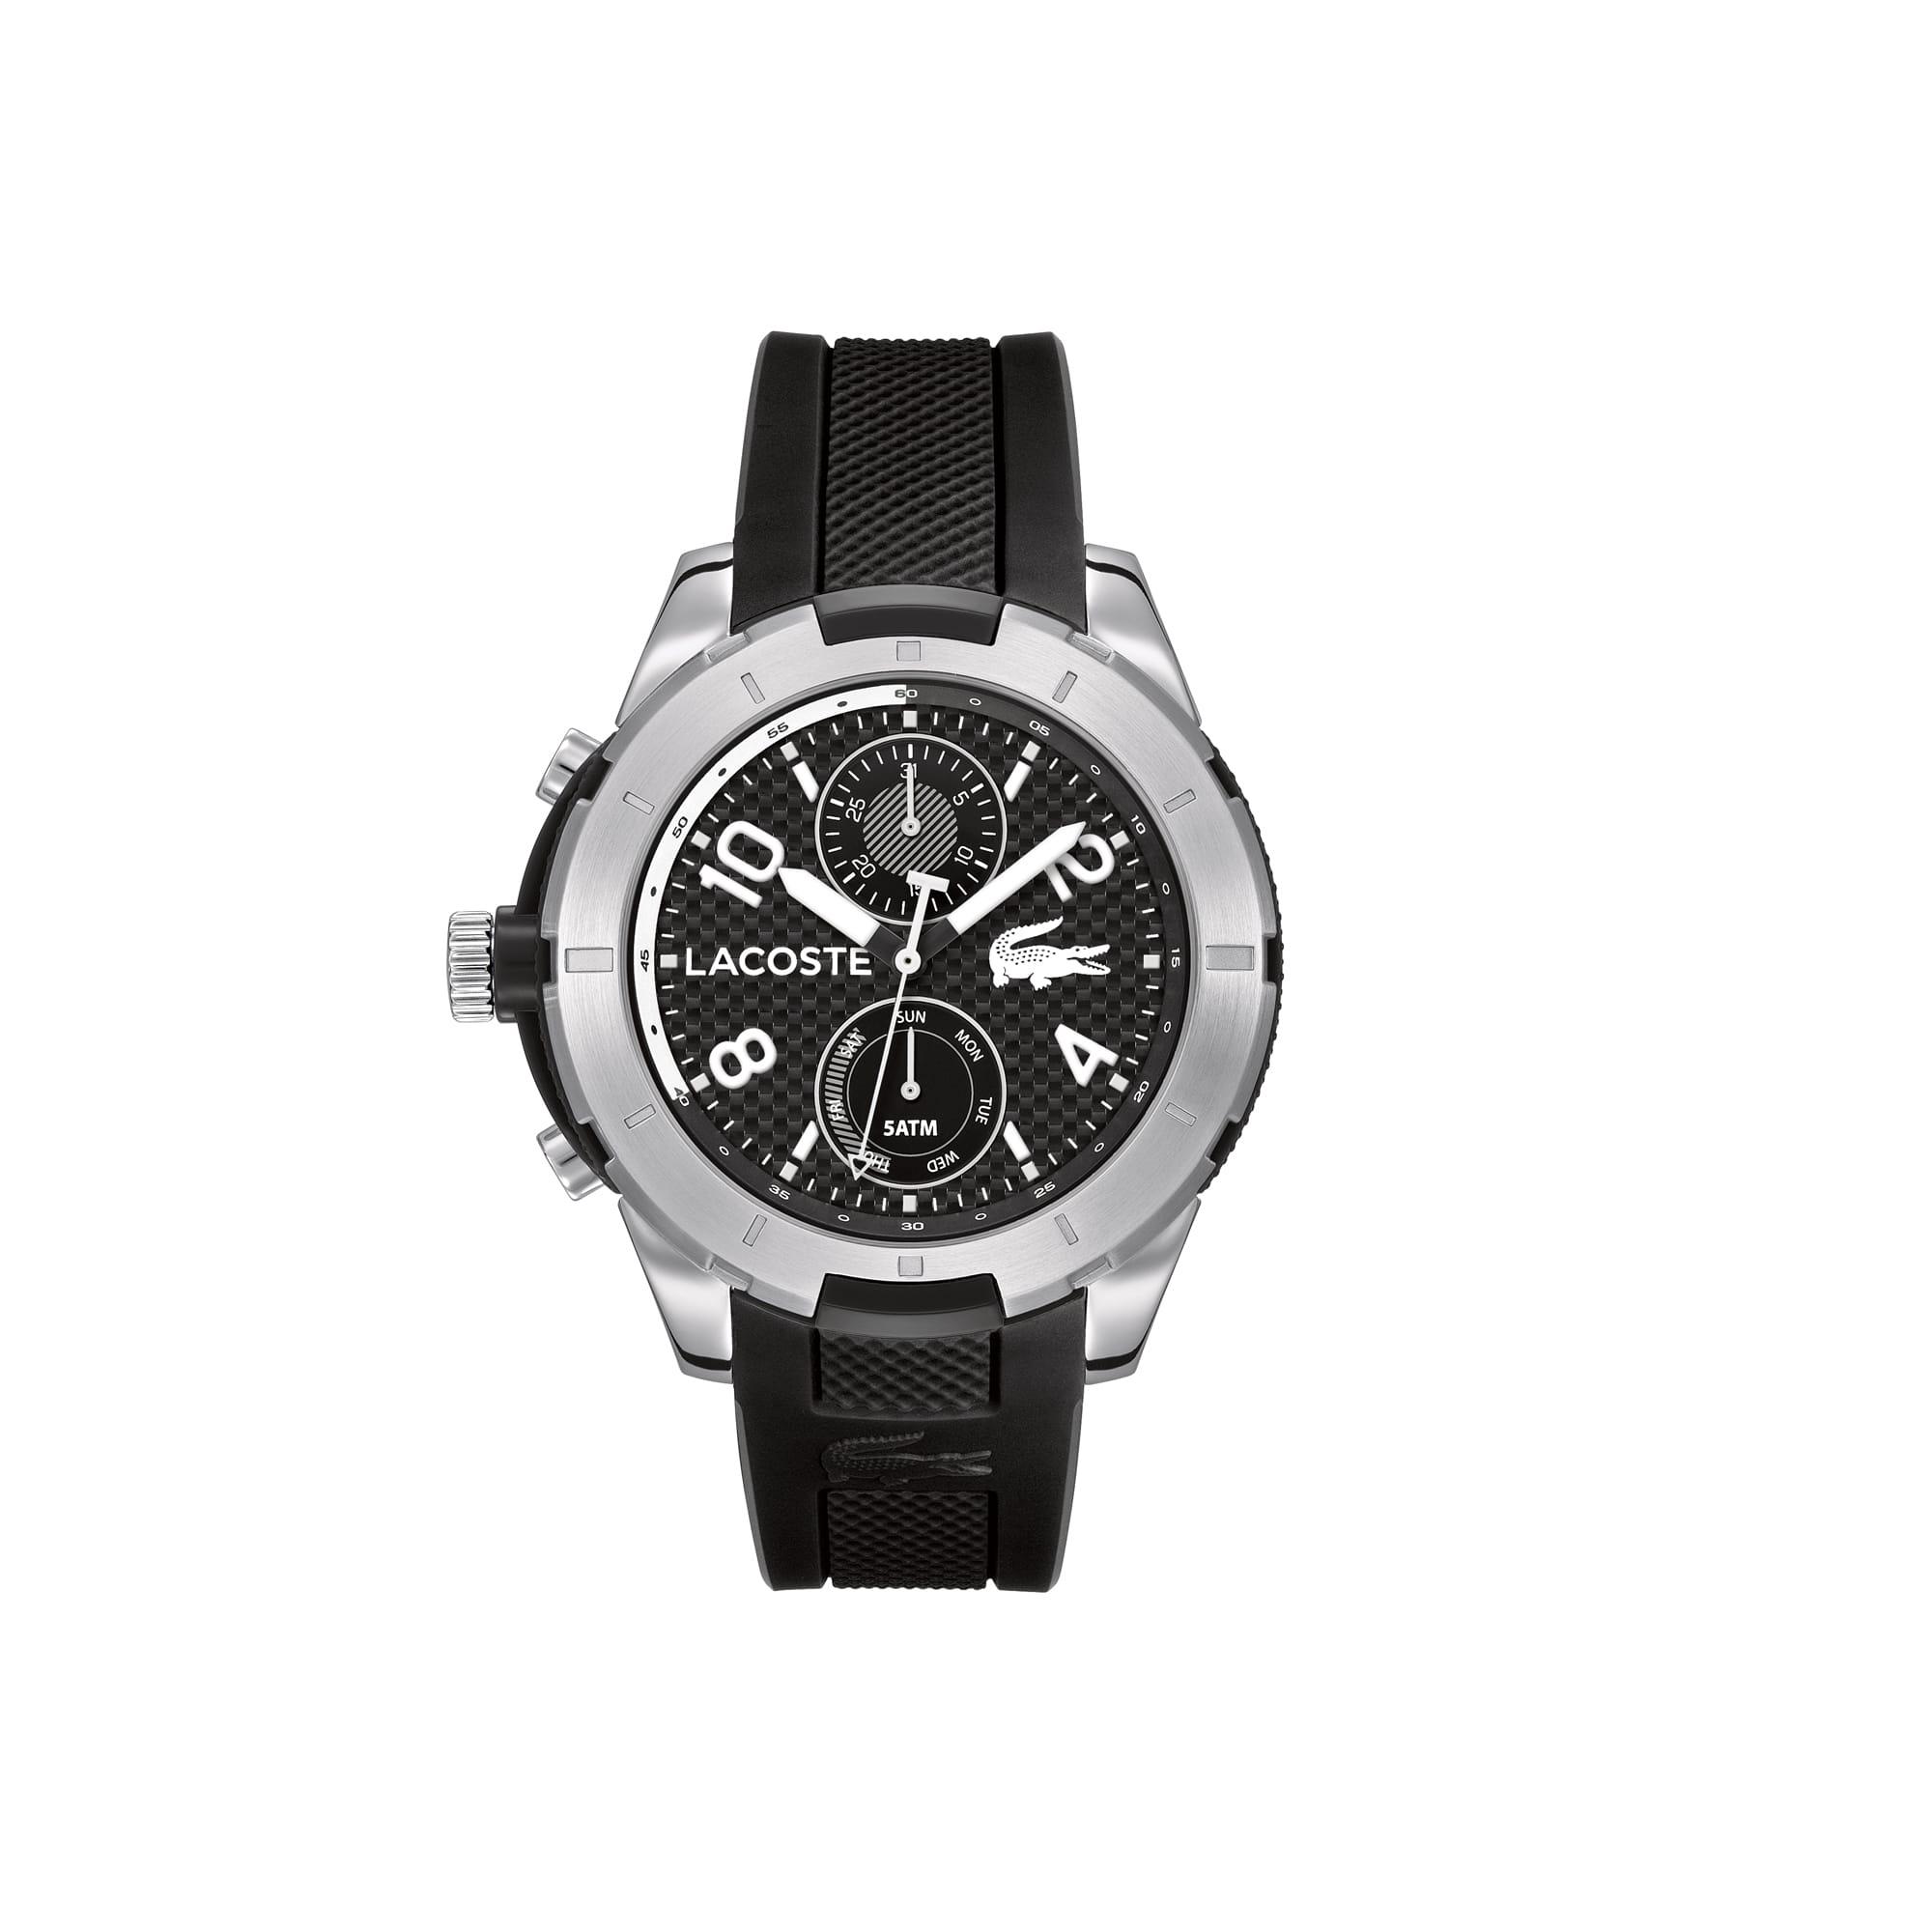 Uhr Tonga mit Silikon-Armband mit Piqué-Struktur